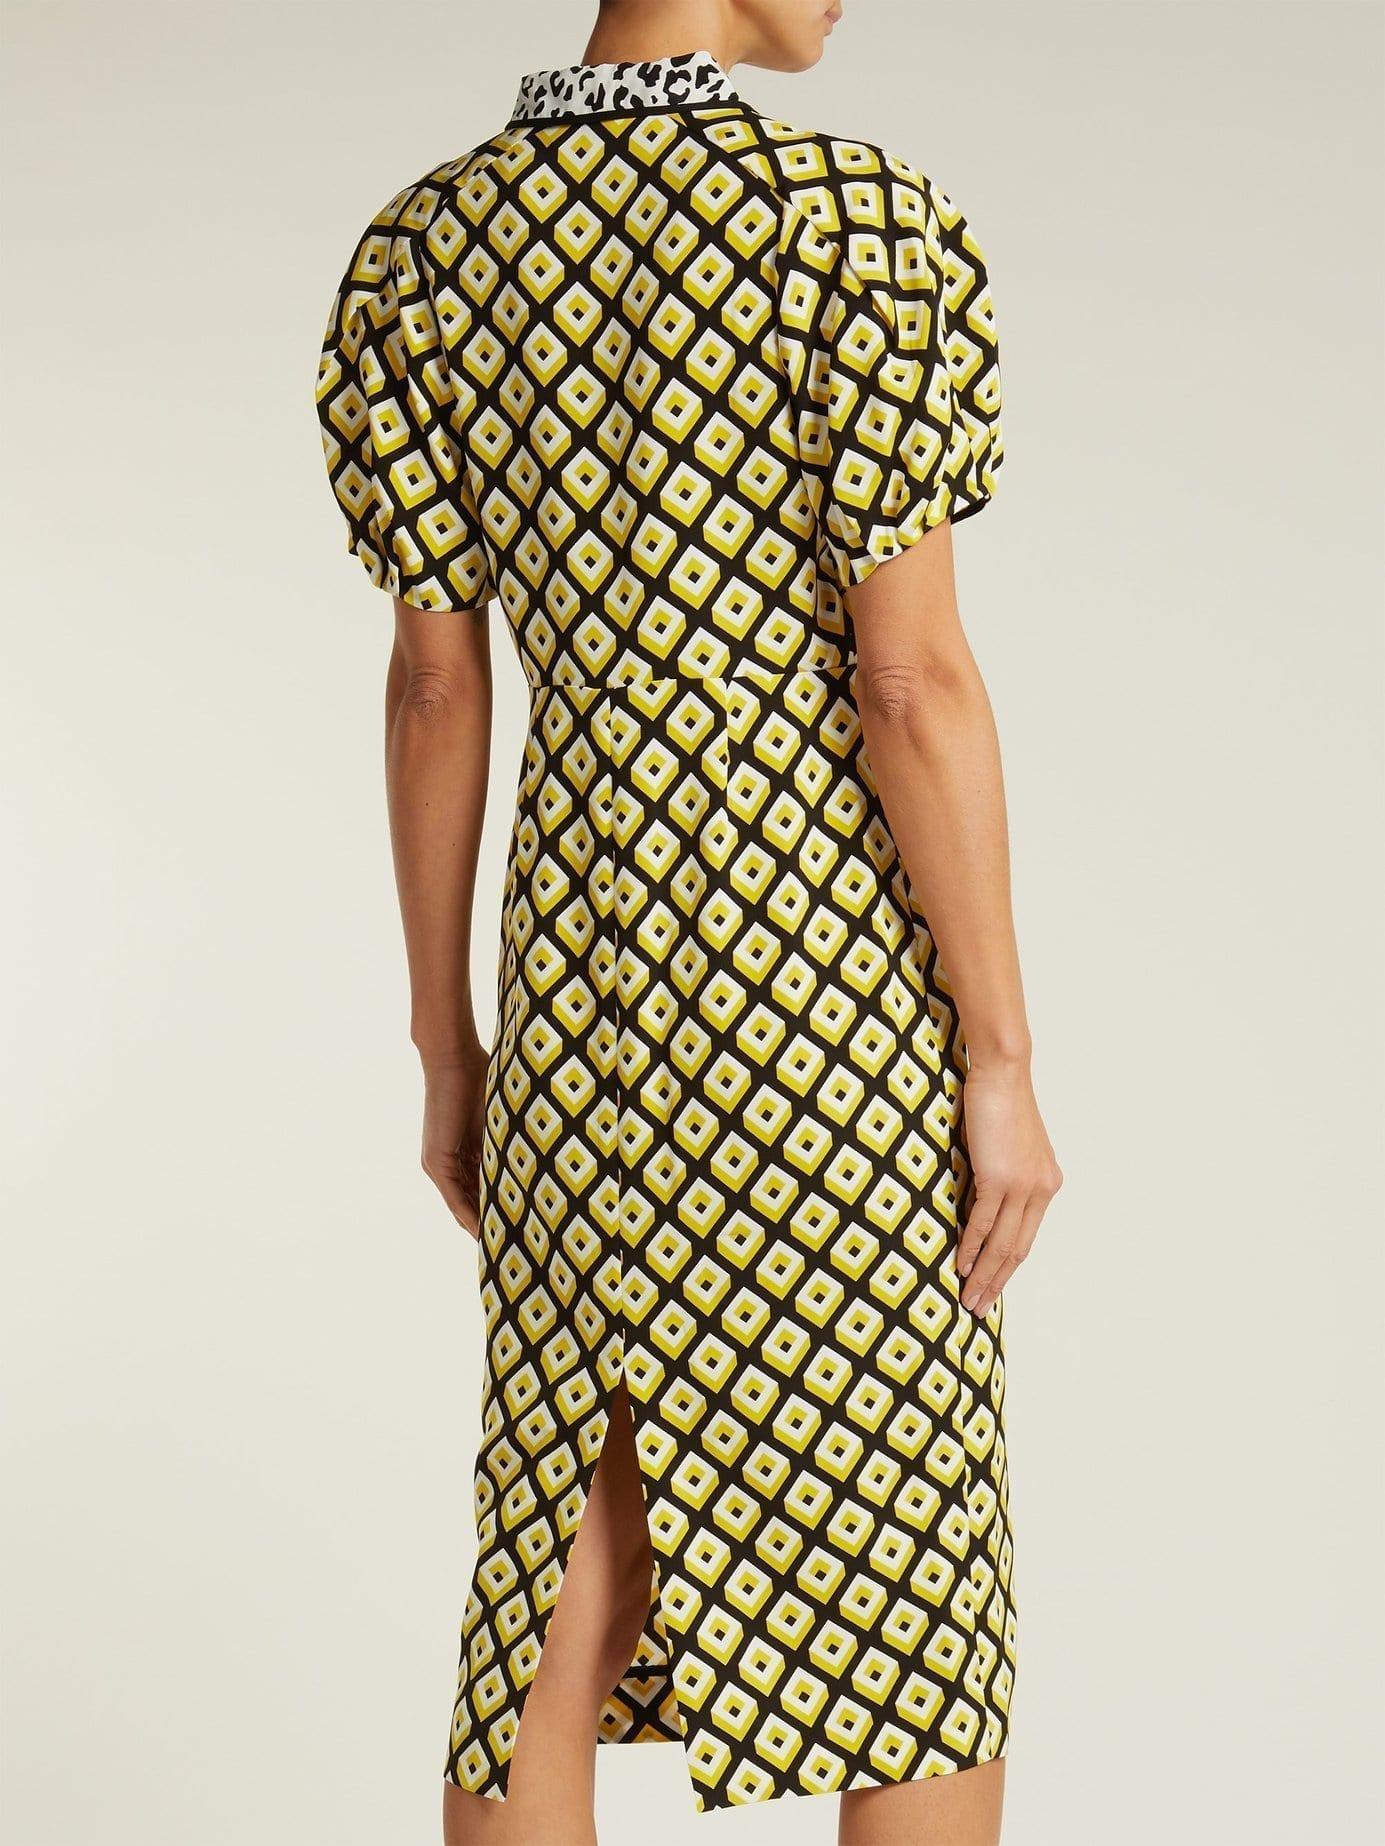 8d52106c615b DIANE VON FURSTENBERG Elly Crepe Midi Yellow Dress - We Select Dresses